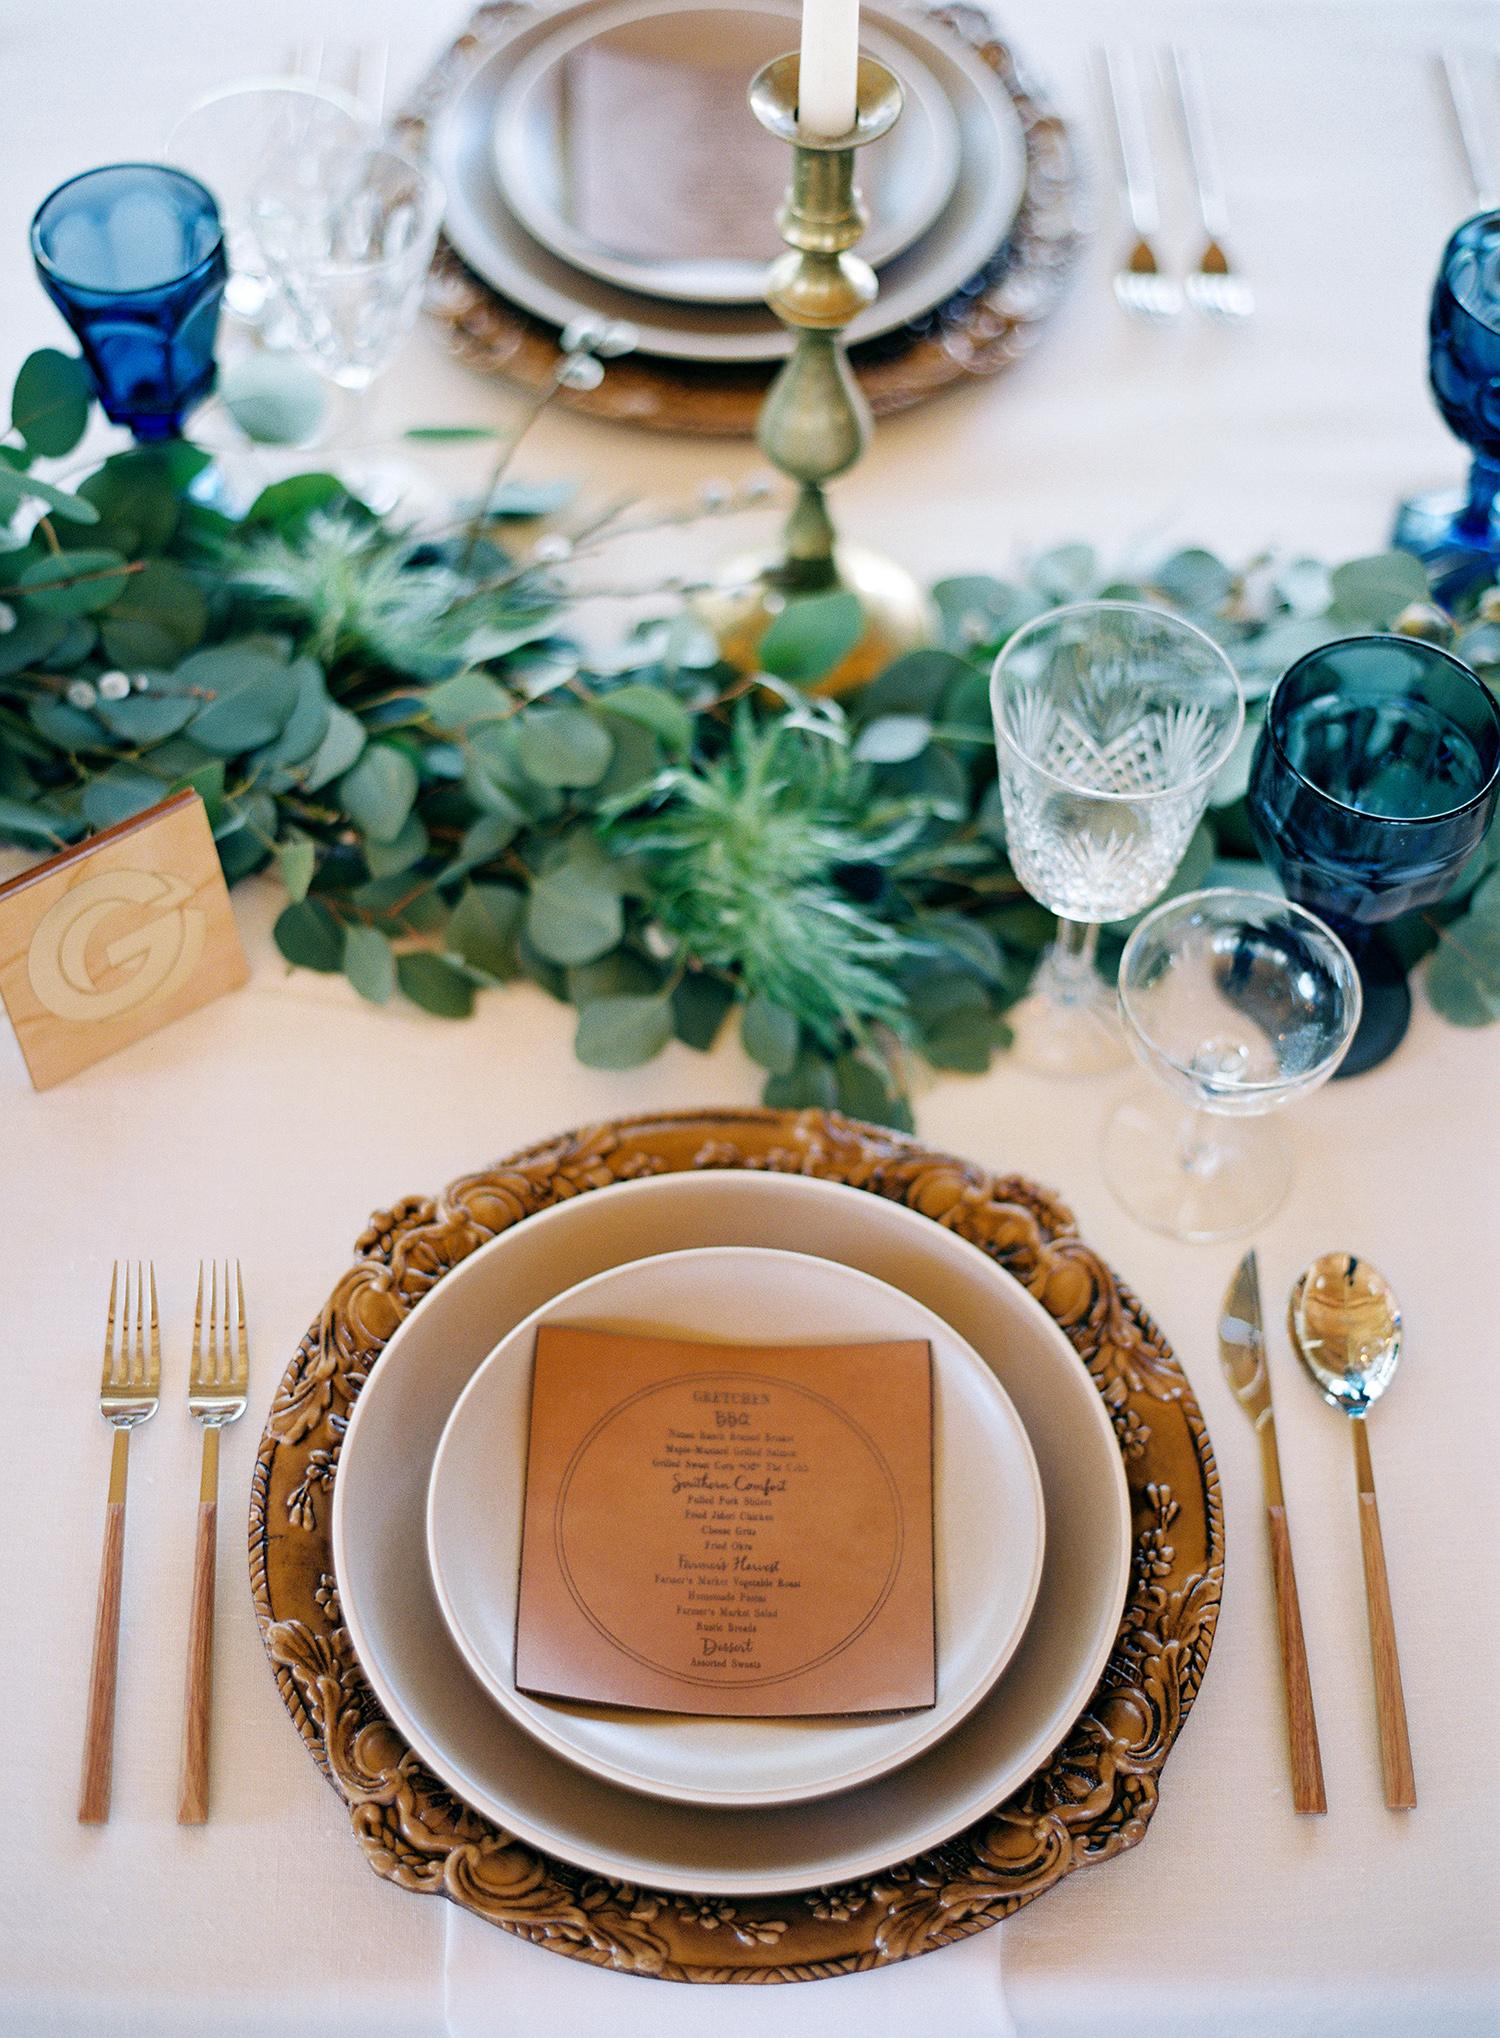 leather wedding ideas menu on formal plate setting